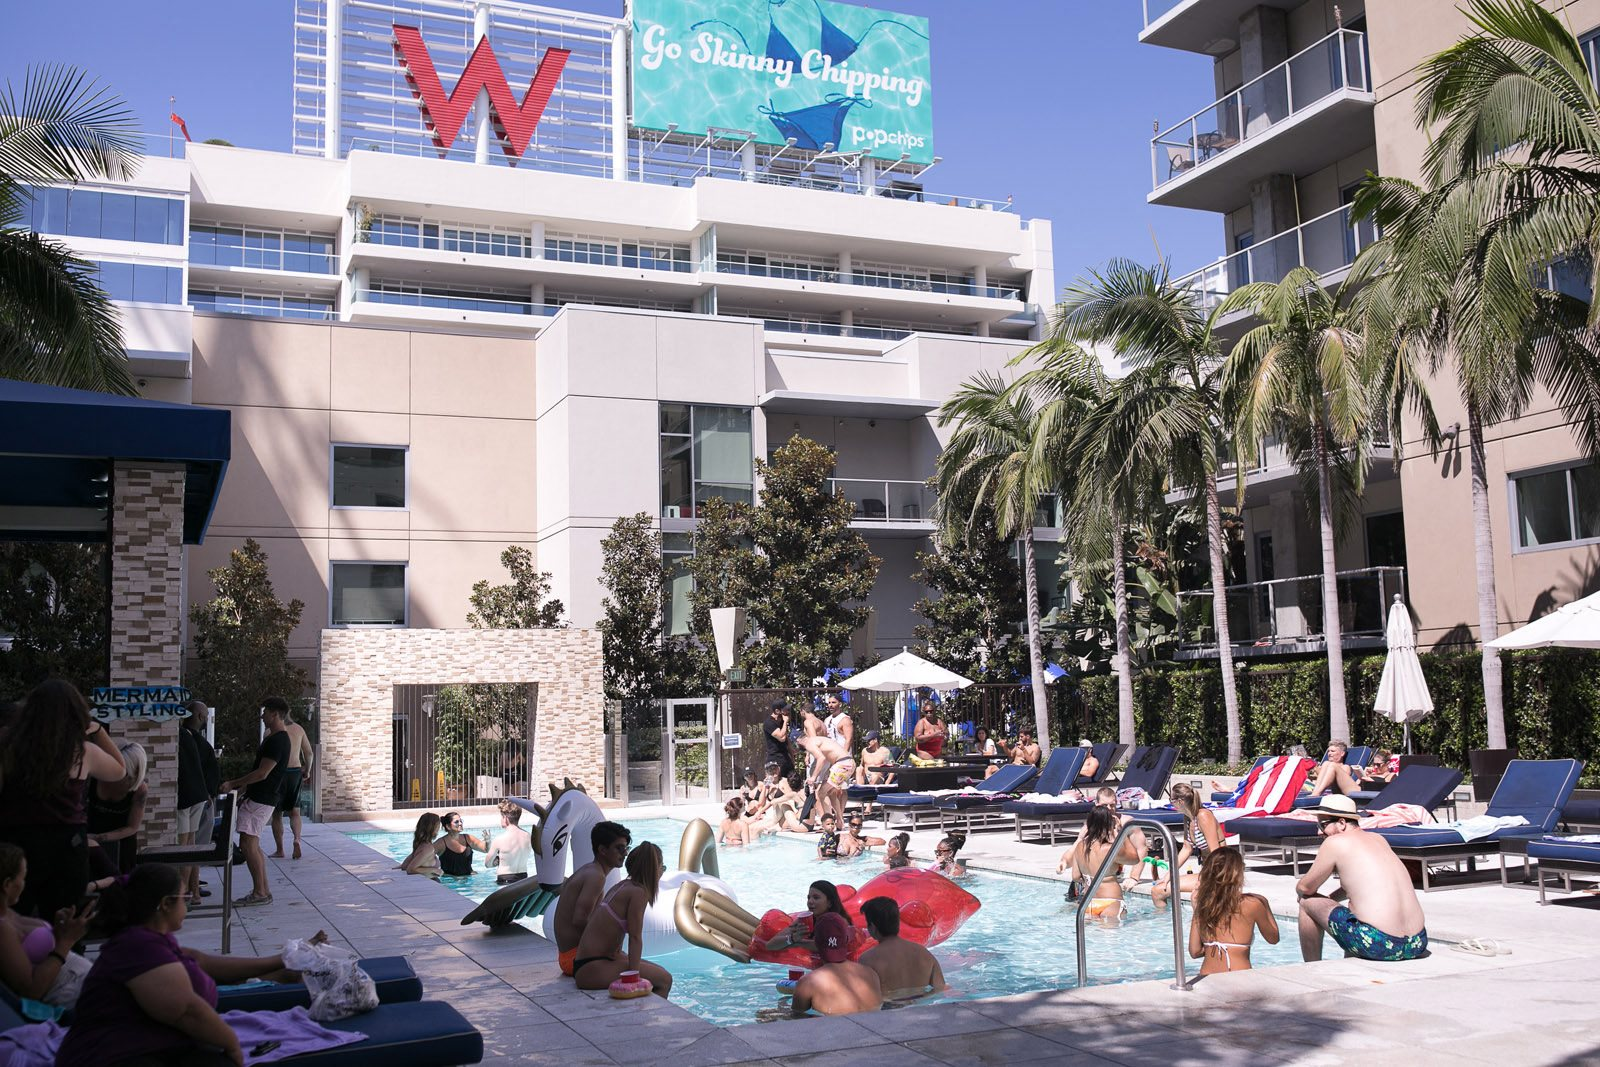 Lifestyle At 1600 Vine Apartment Homes Los Angeles 90028